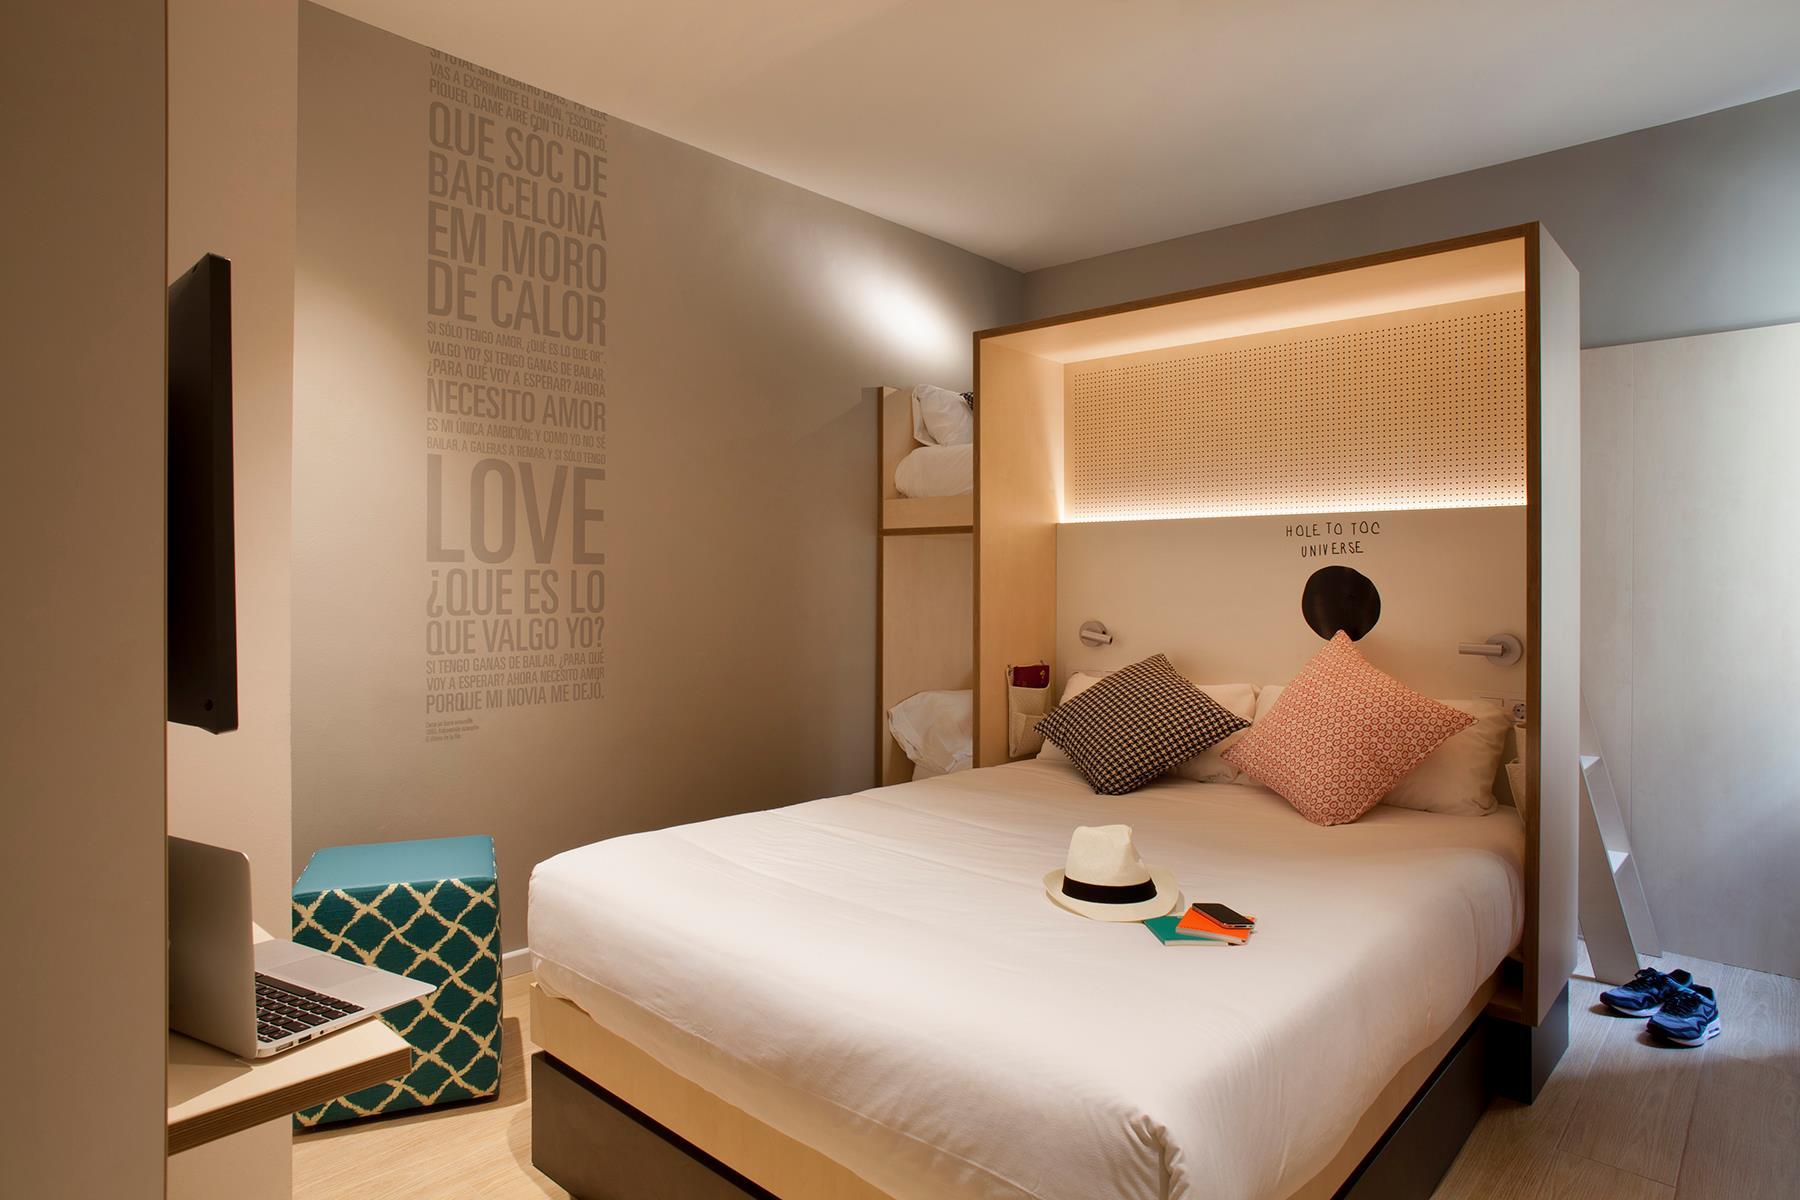 October in barcelona toc hostel barcelona part 2 2 spoonful of home design - Toc toc barcelona ...